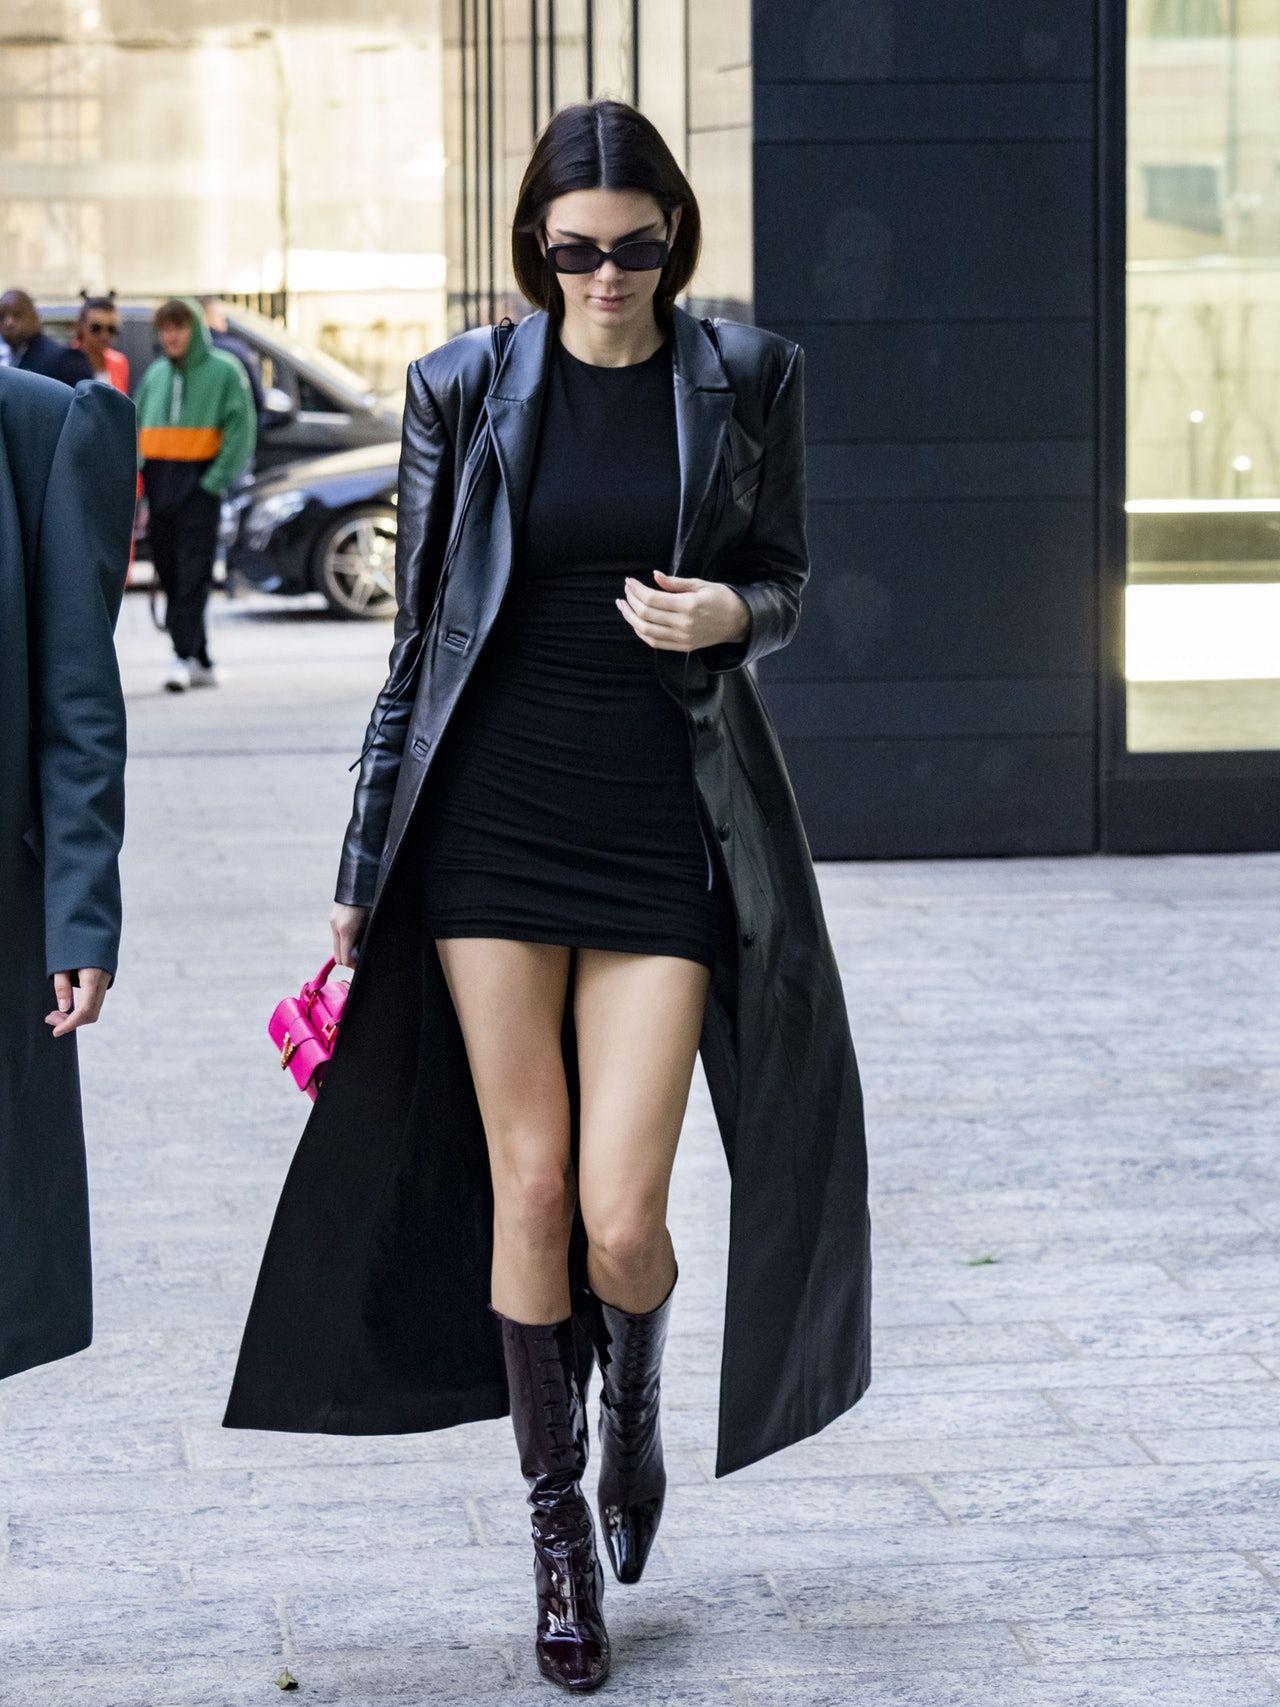 You Ll Never Believe Where Kendall Jenner Got Her Little Black Dress Kendall Jenner Street Style Milan Fashion Week Street Style Fashion Week Street Style [ 1707 x 1280 Pixel ]